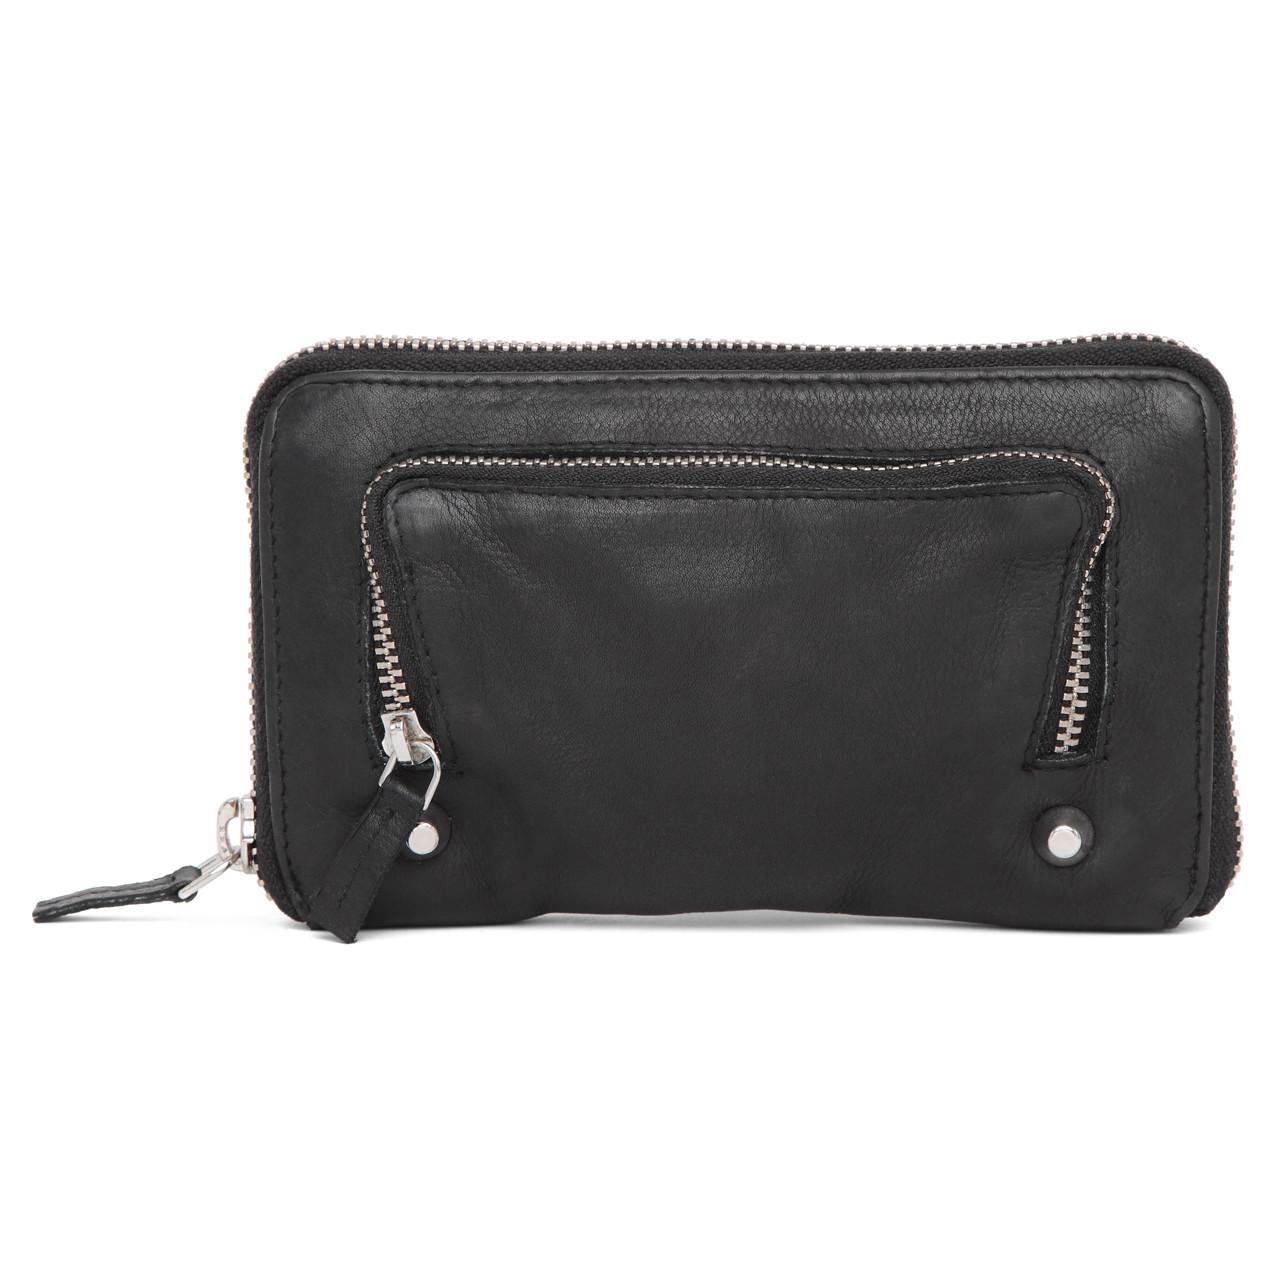 Adax Rubicone Trish pung med lynlås i skind